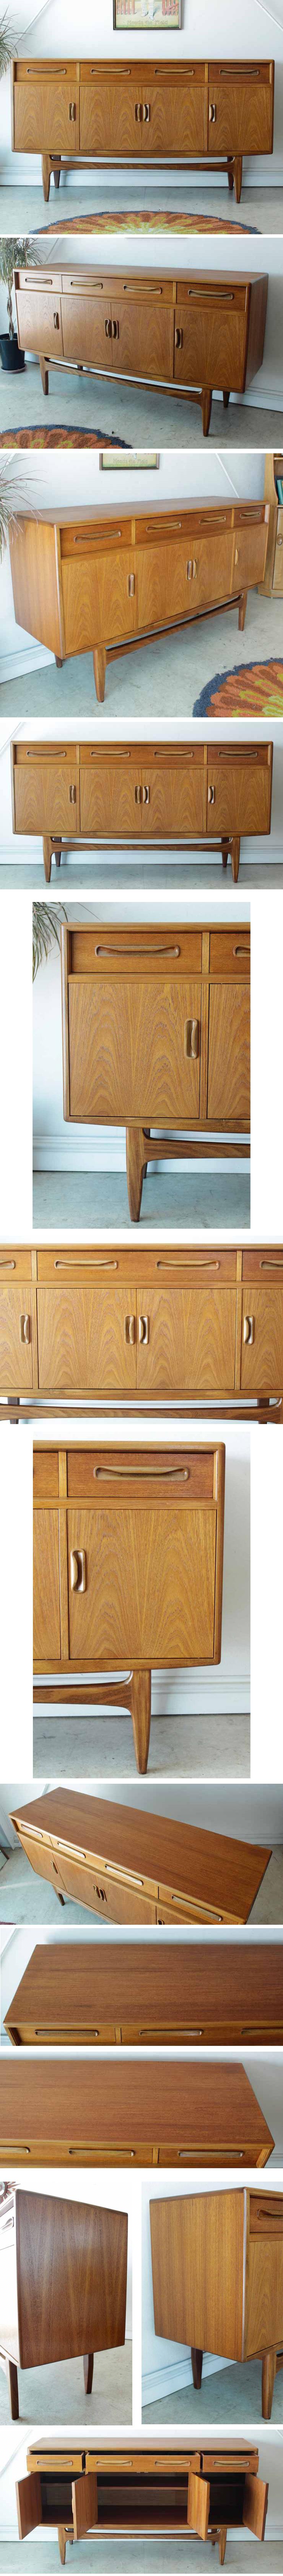 G-planジープラン【チーク】フレスコサイドボード/ビンテージ家具ミッドセンチュリー北欧アンティーク